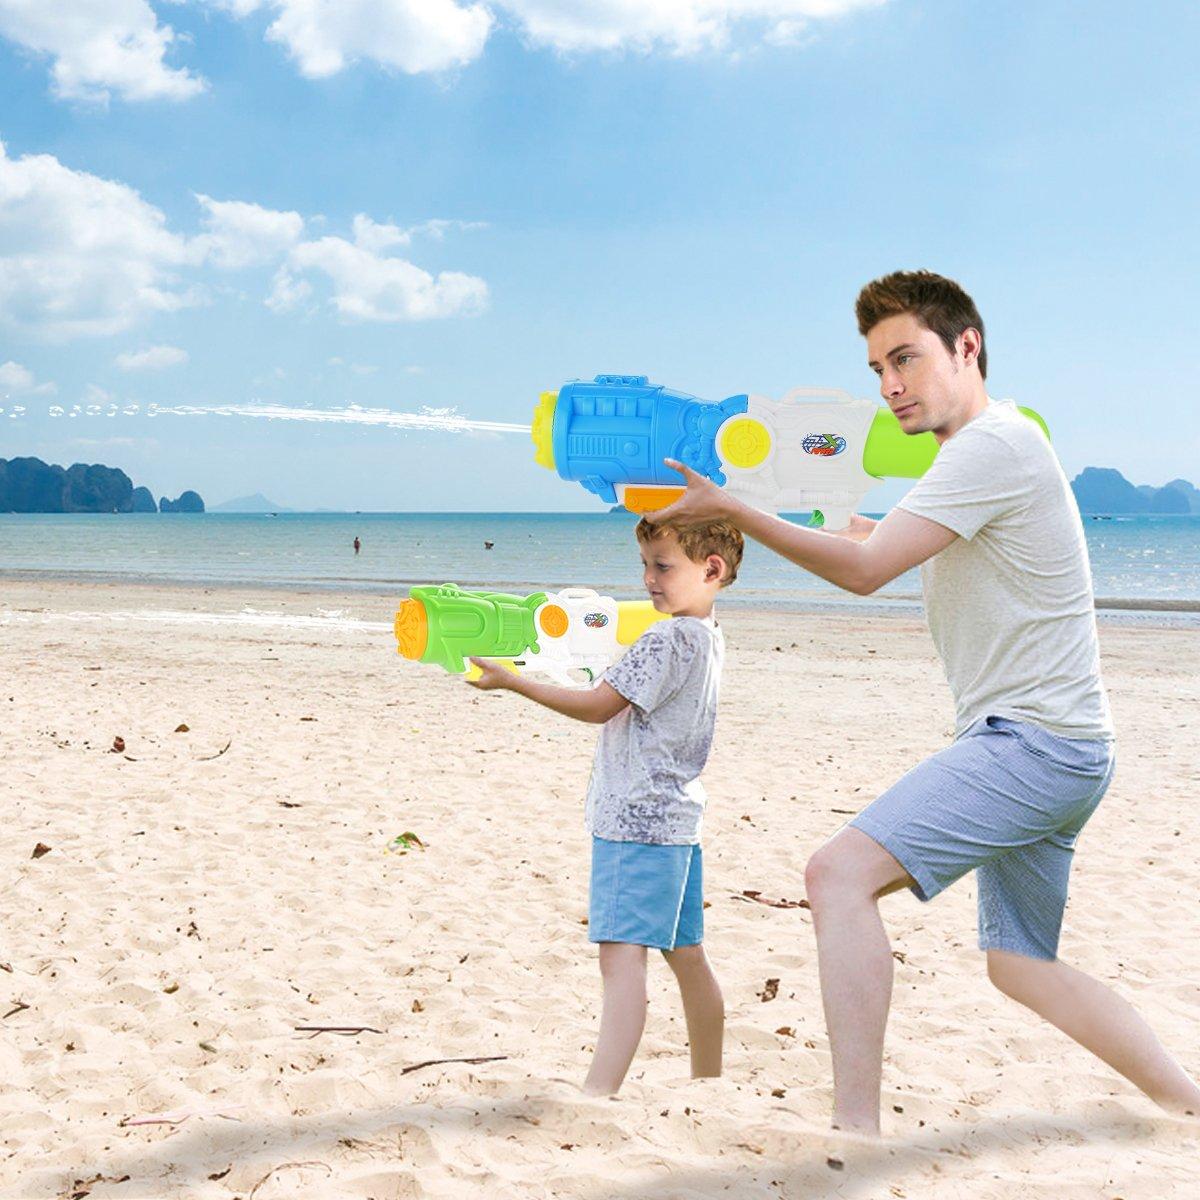 Fun-Here Huge! Water Guns 21 inch 2 Packs Blaster High Capacity Super Squirt Soaker Water Pistol Blaster Gun Funny Party Pool Summer Fighting Toy Kids Adults